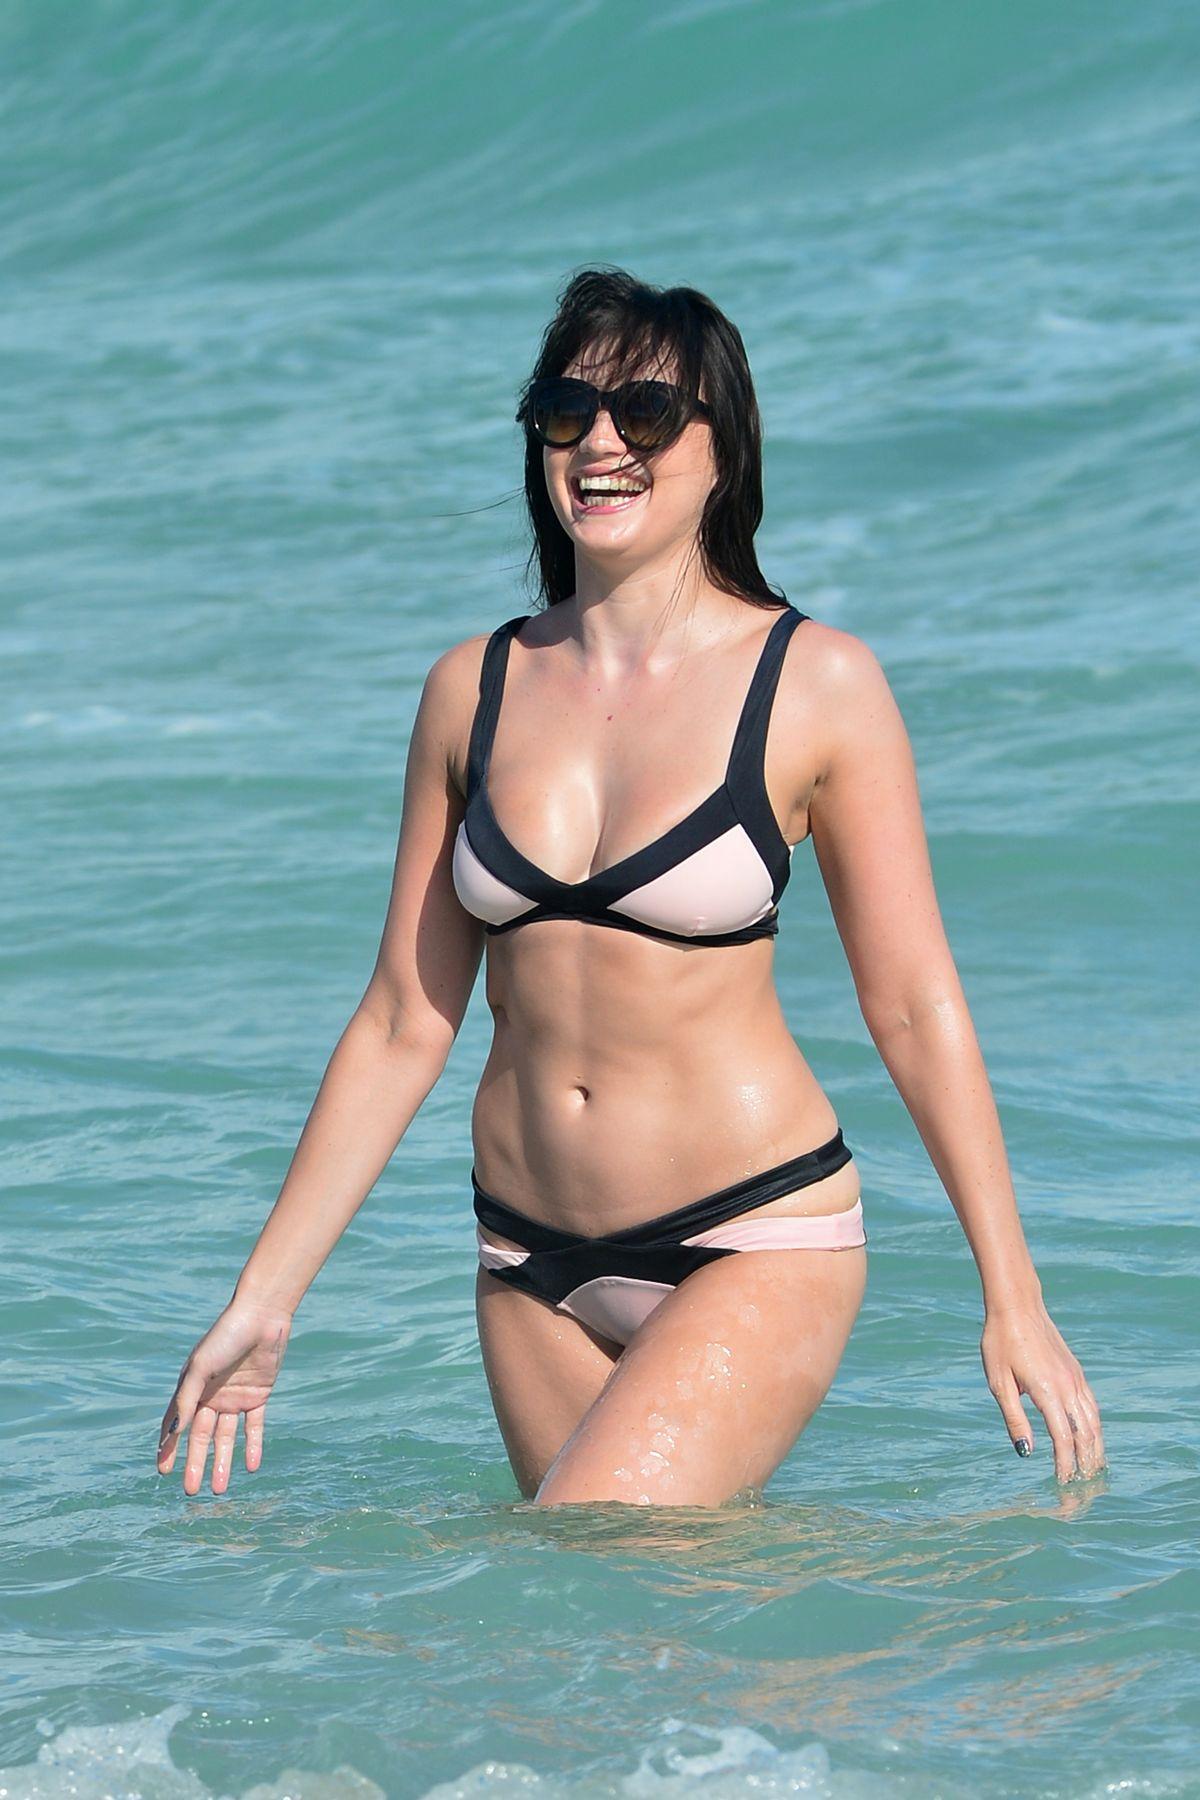 Bryana Holly MQ Tuesdays without Bryana Adult pic Ildiko ferenczi,Helena Bonham Carter Nude And Sexy - 47 Photos